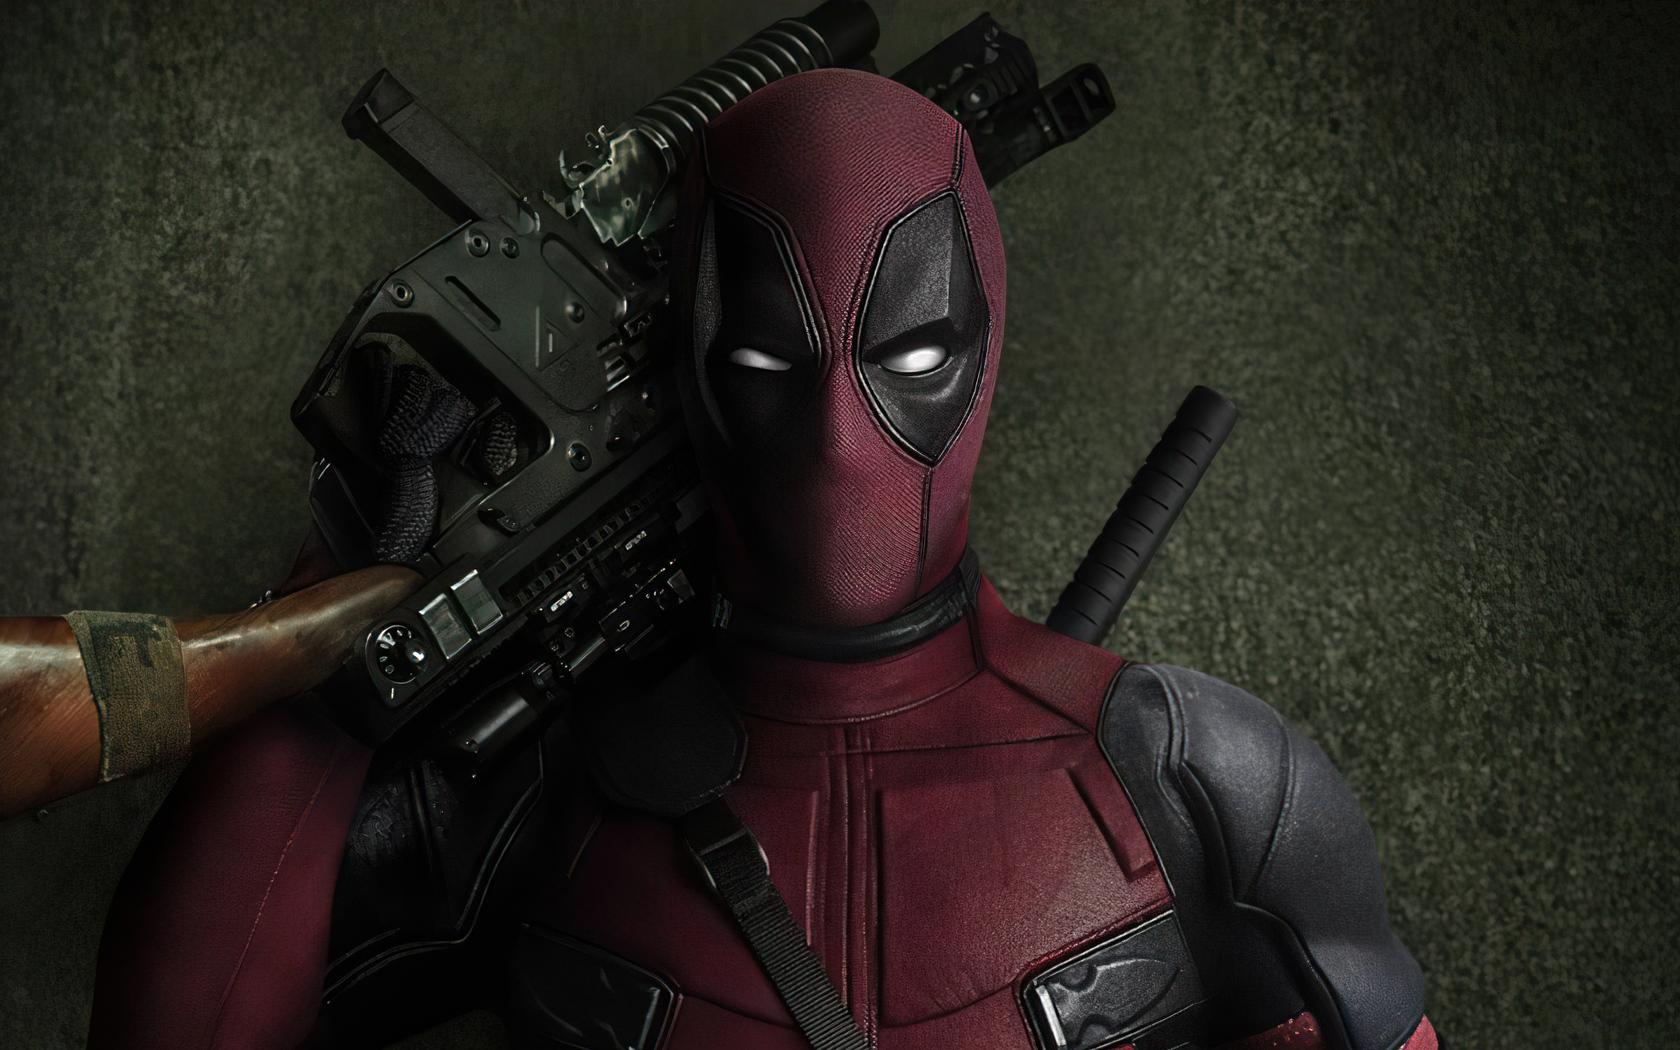 deadpool-2-gun-4k-mx.jpg